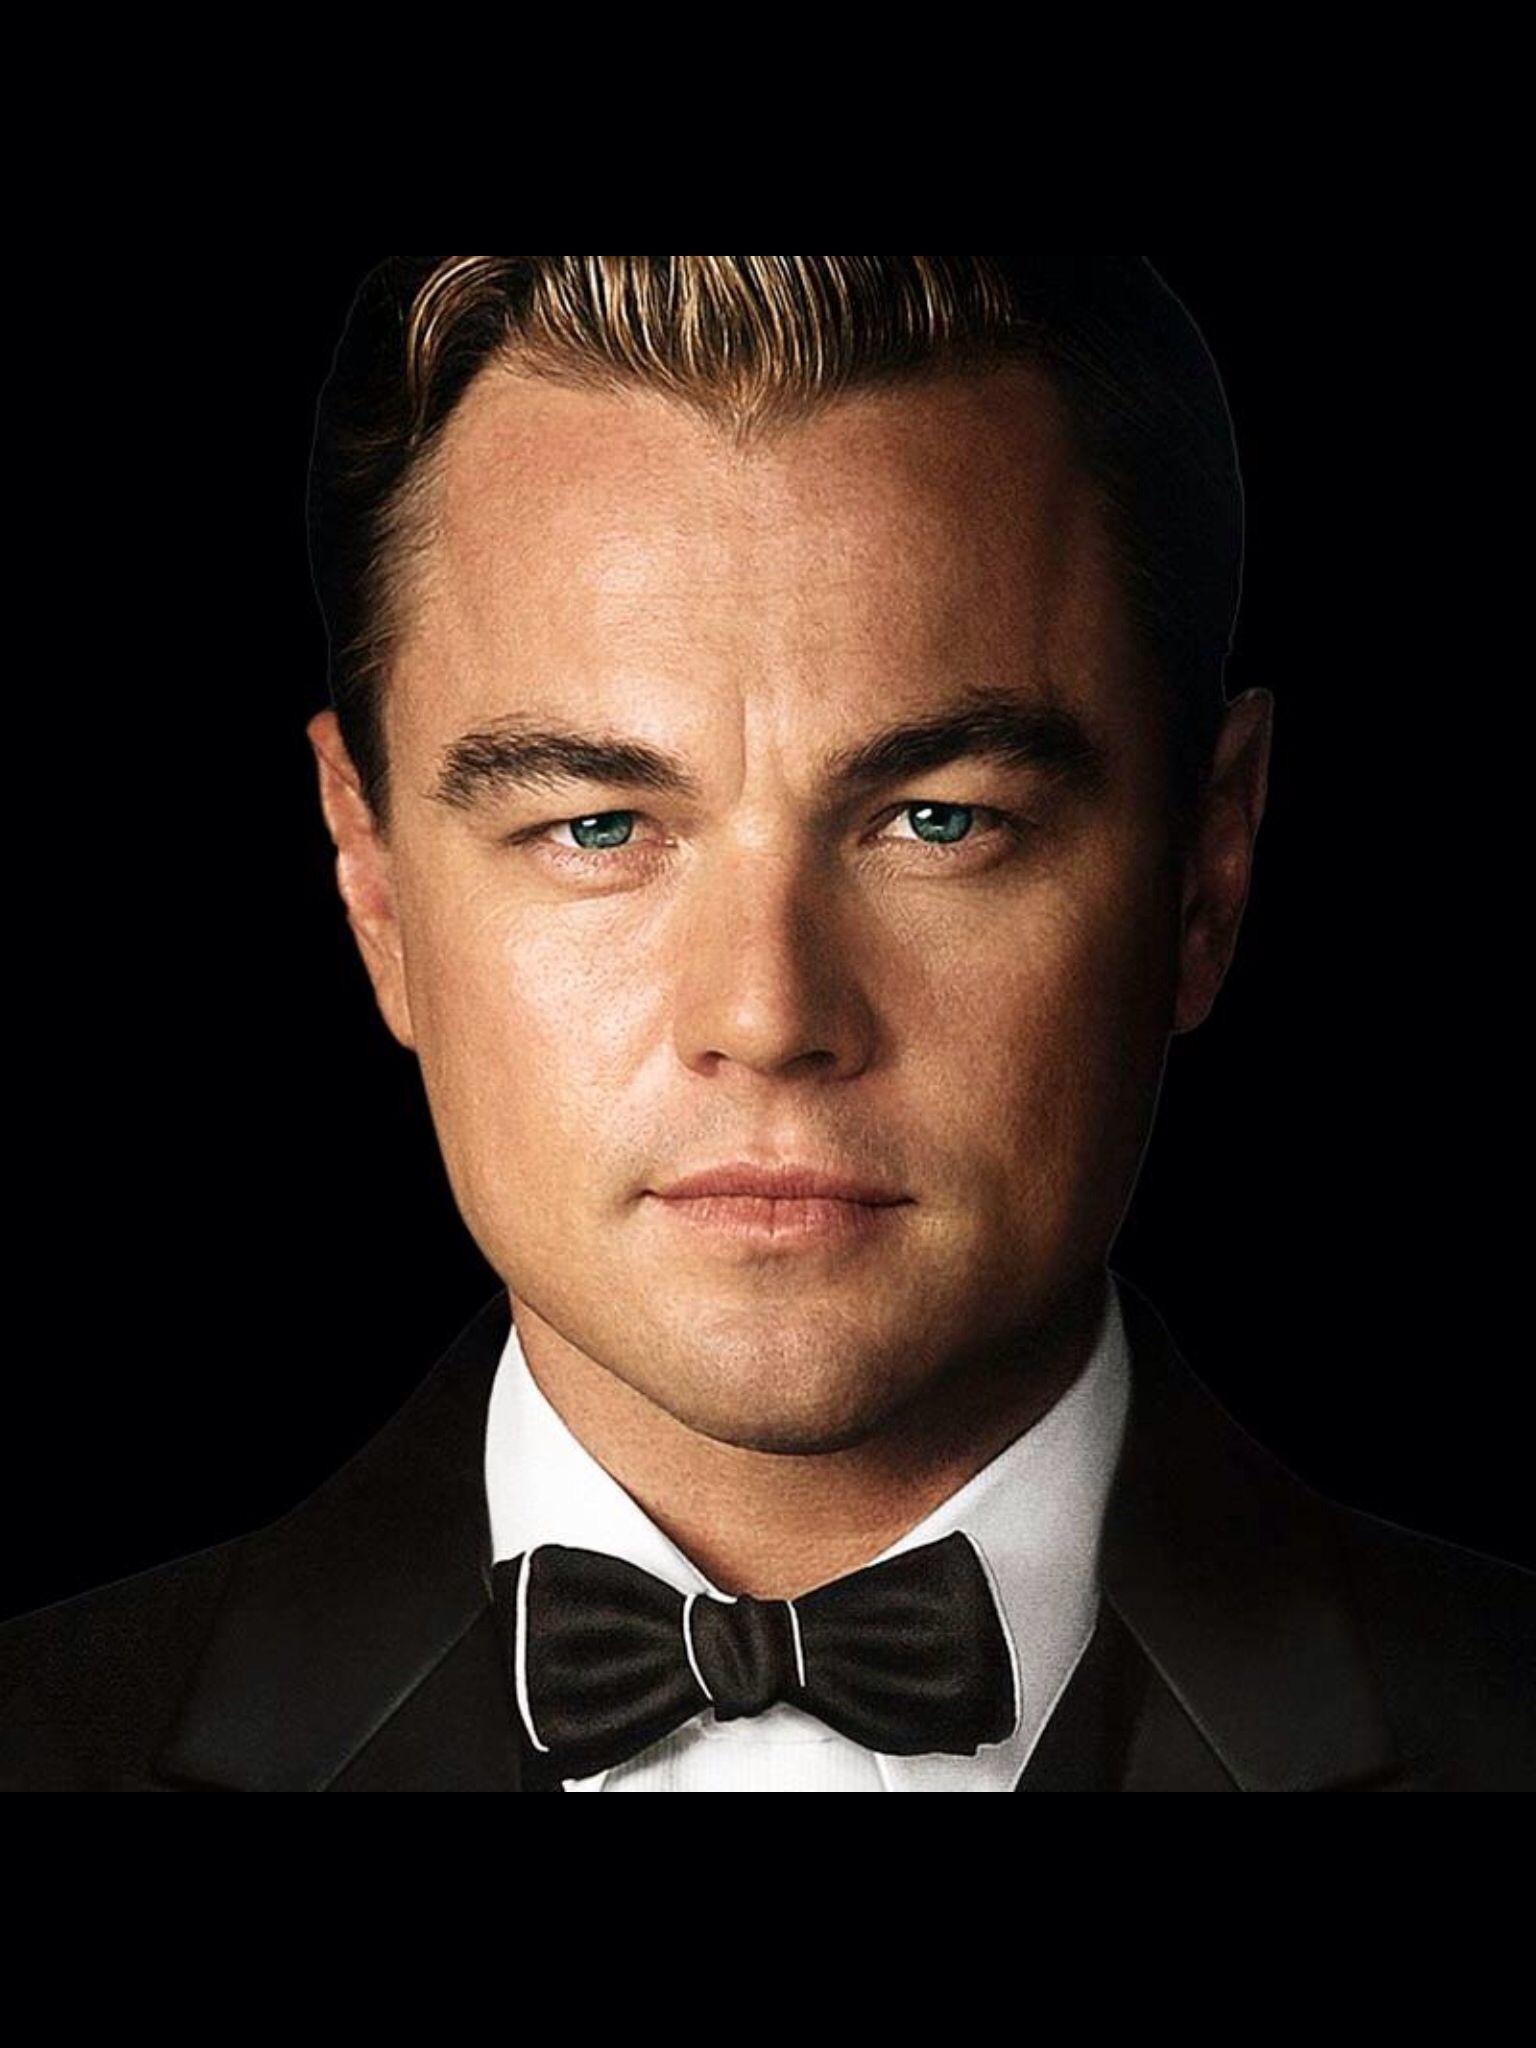 He's hot | Leonardo dicaprio, The great gatsby 2013, Good ...